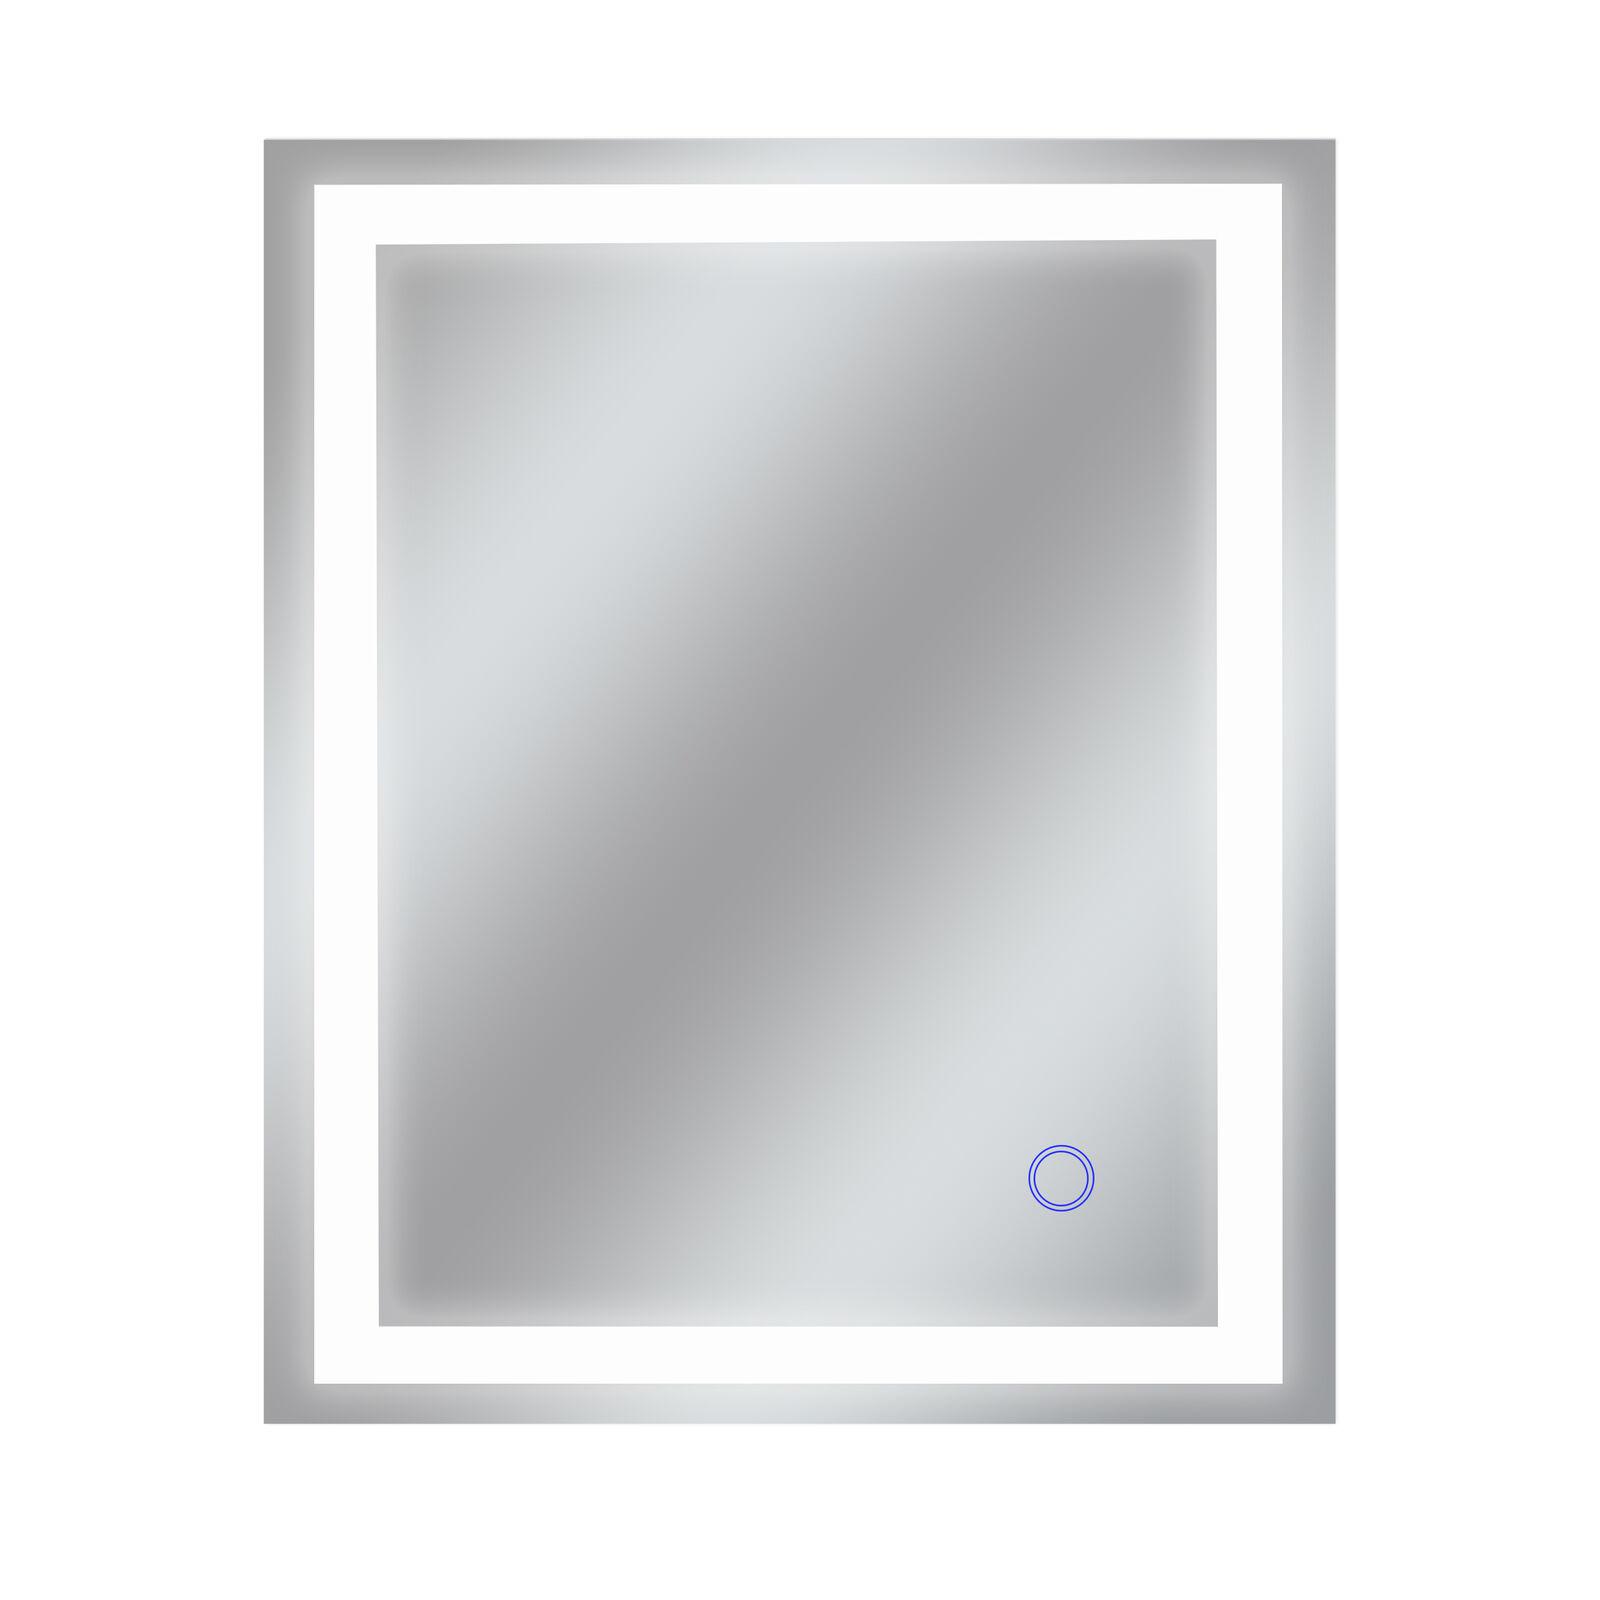 Dyconn Faucet Edison Tri-Farbe Backlit Bathroom LED Mirror (30 W x 36 H)